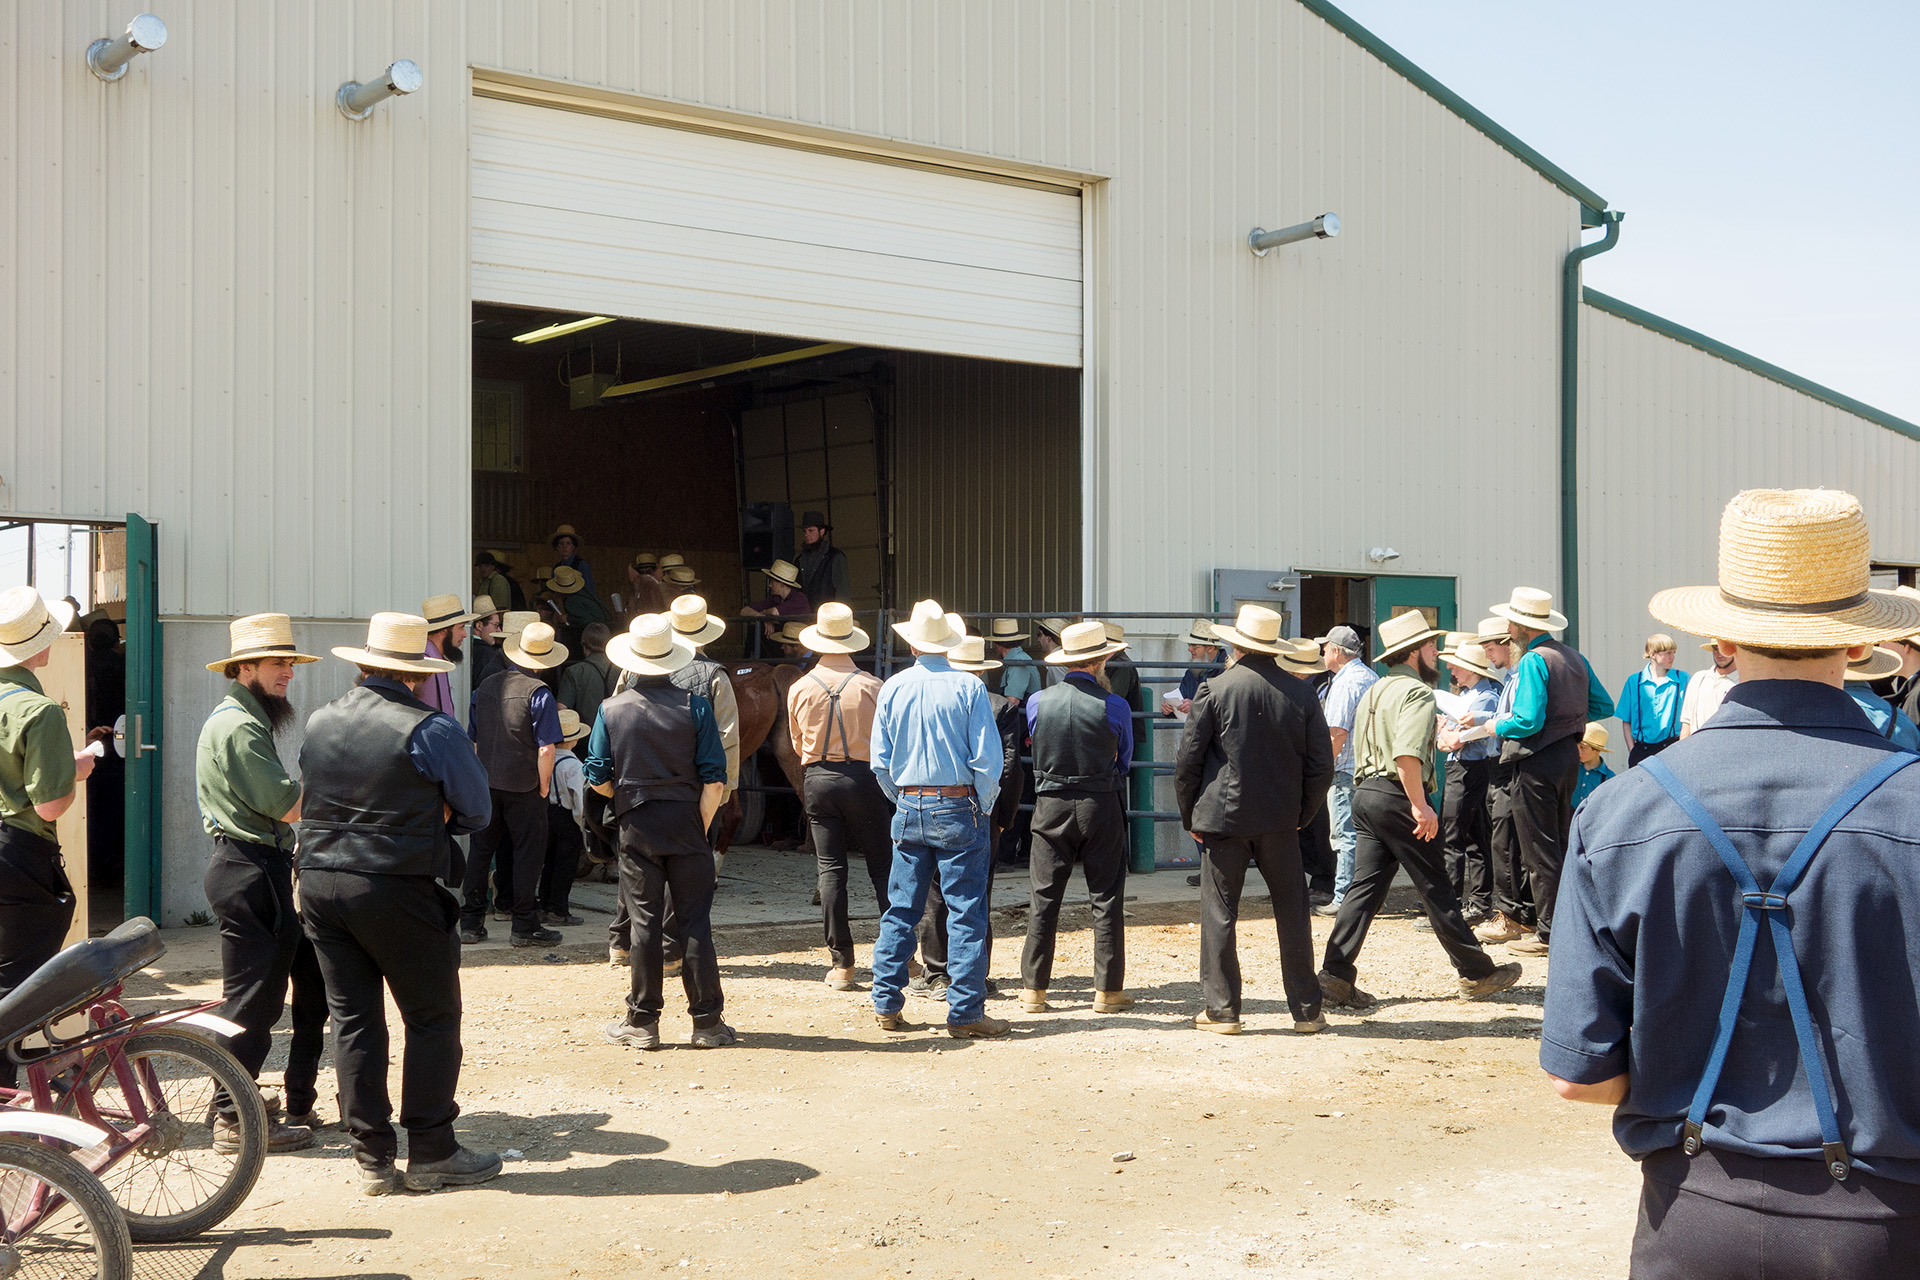 Livestock speculators at the Mud Sale.